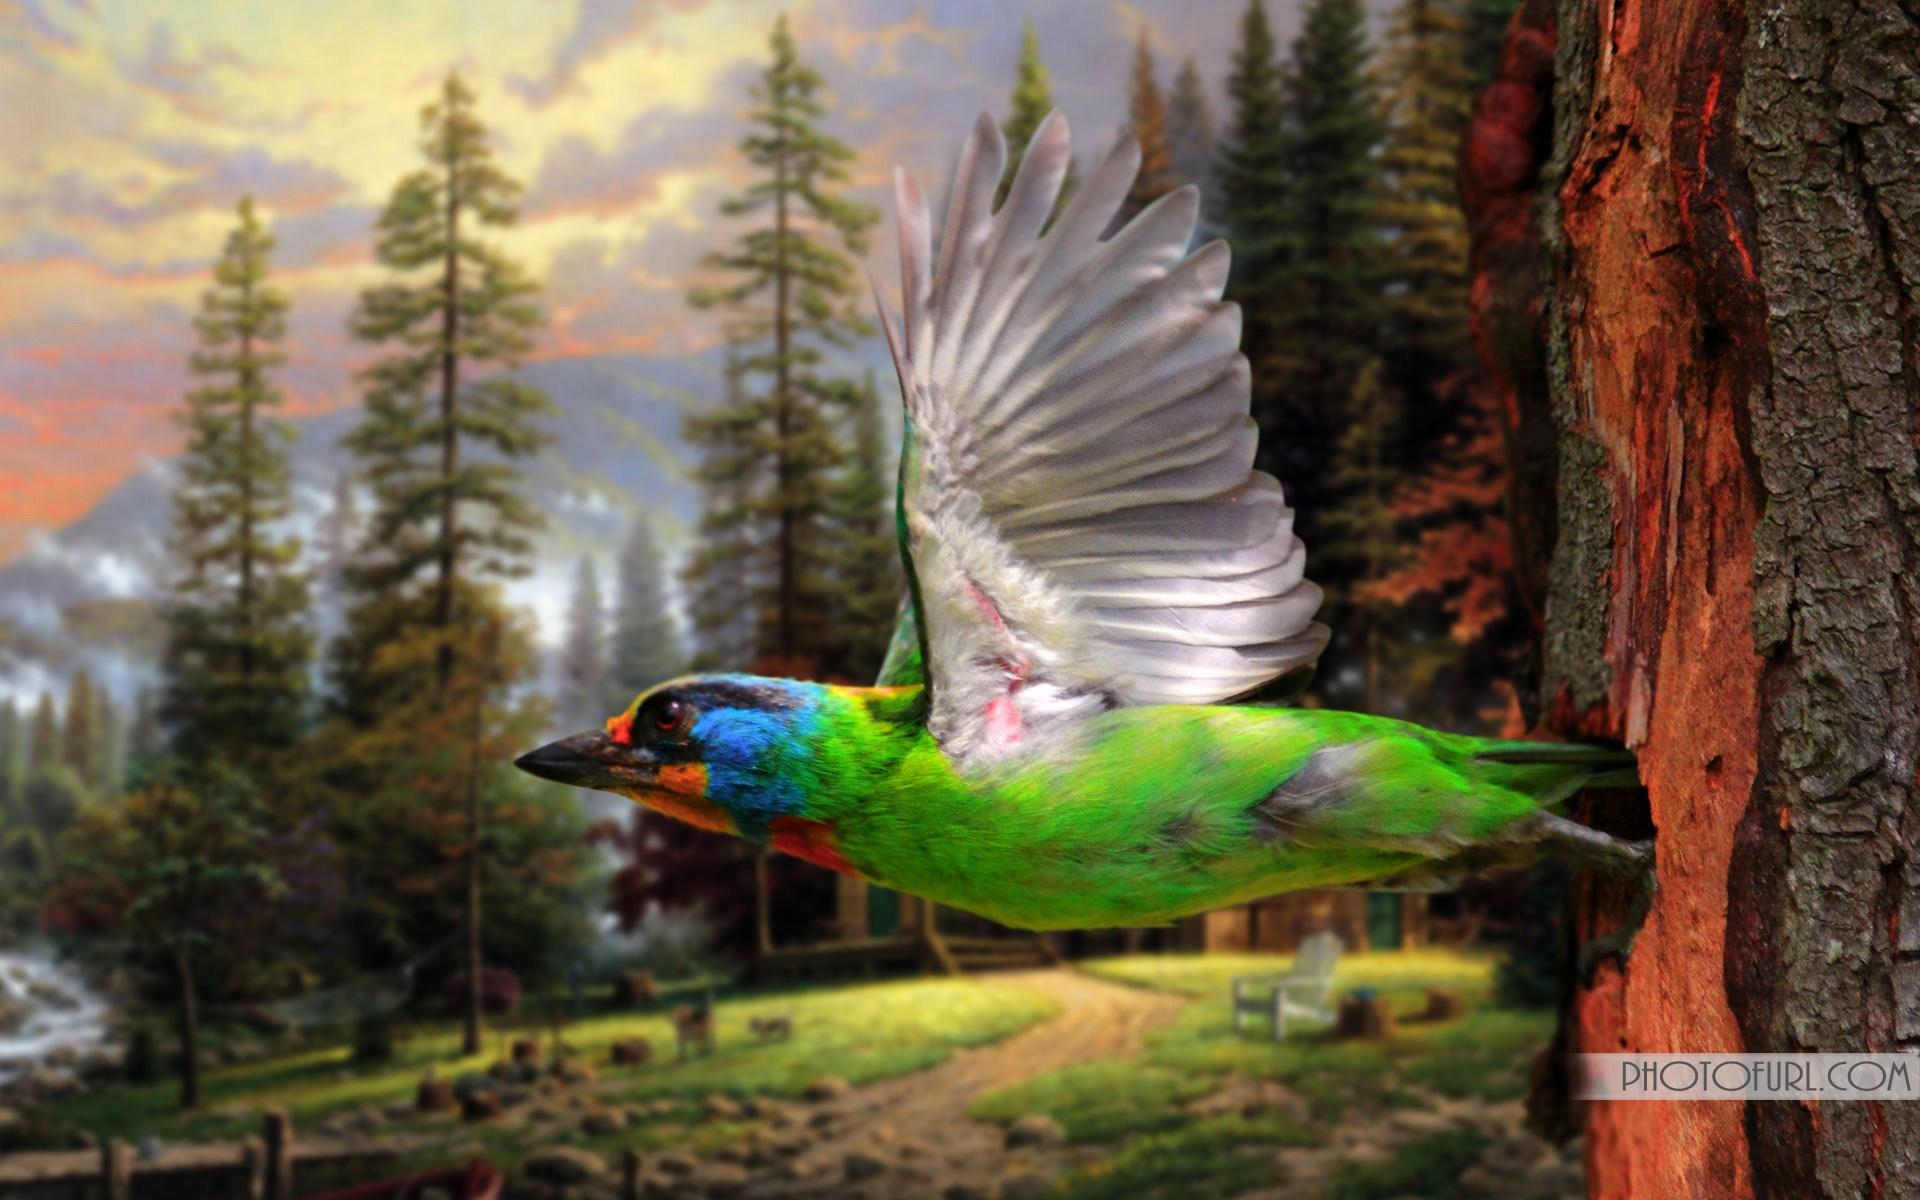 rare wallpaper,bird,vertebrate,beak,nature,organism